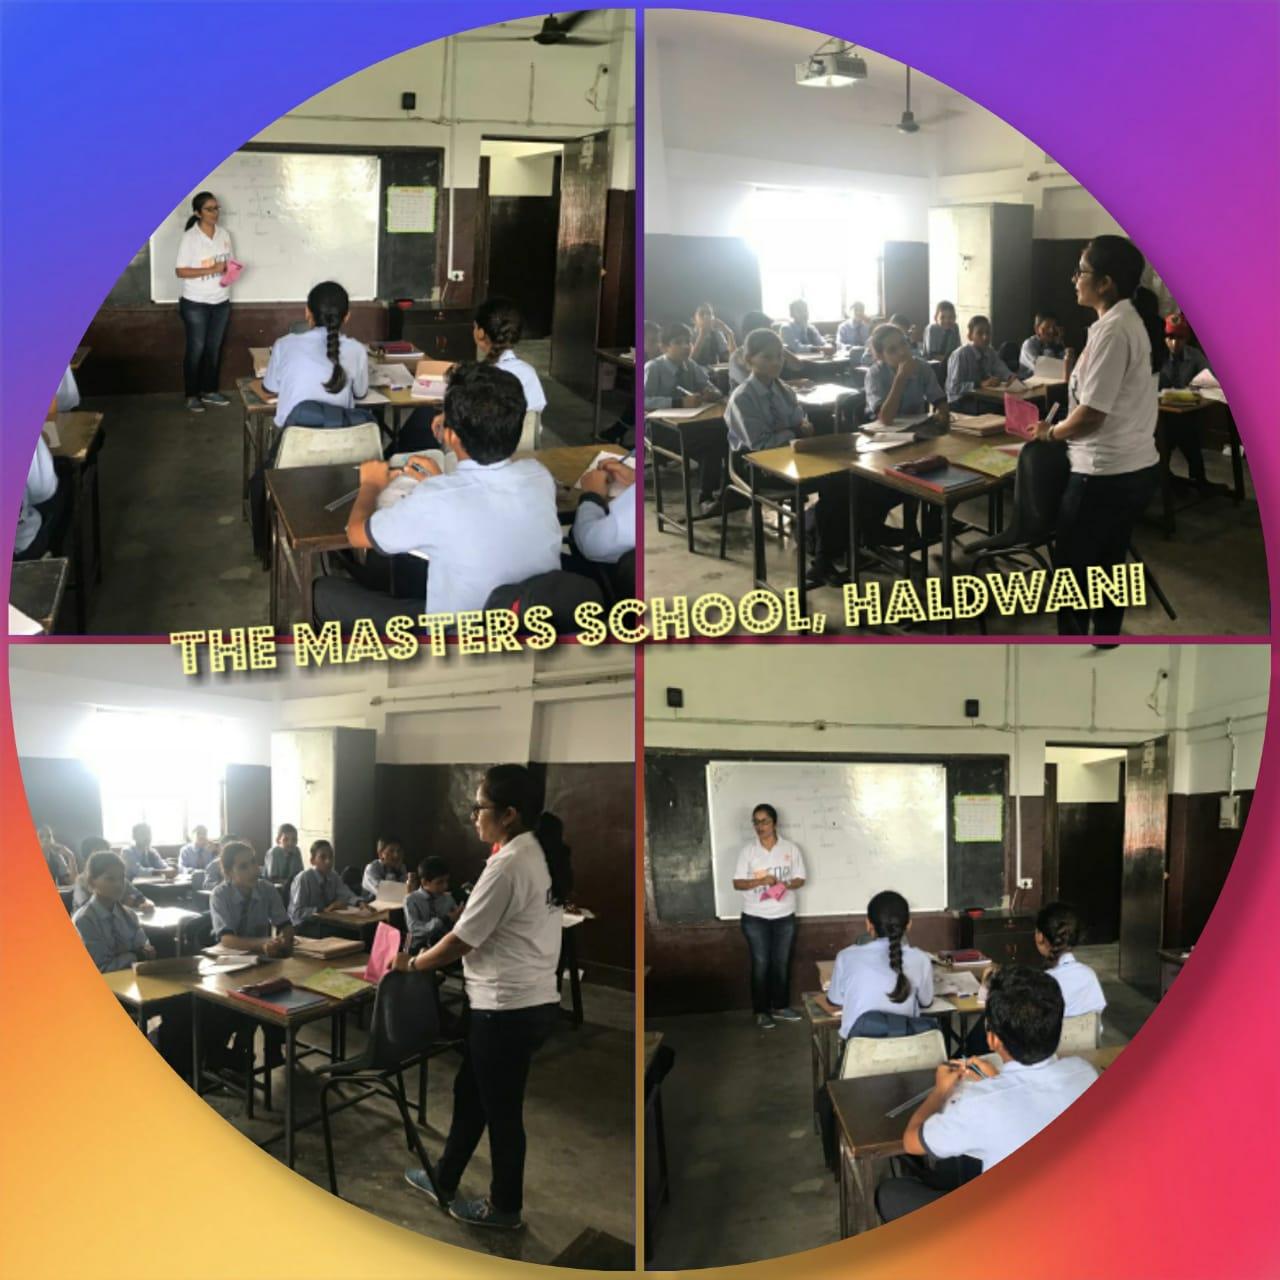 The Master's School, HALDWANI.jpeg